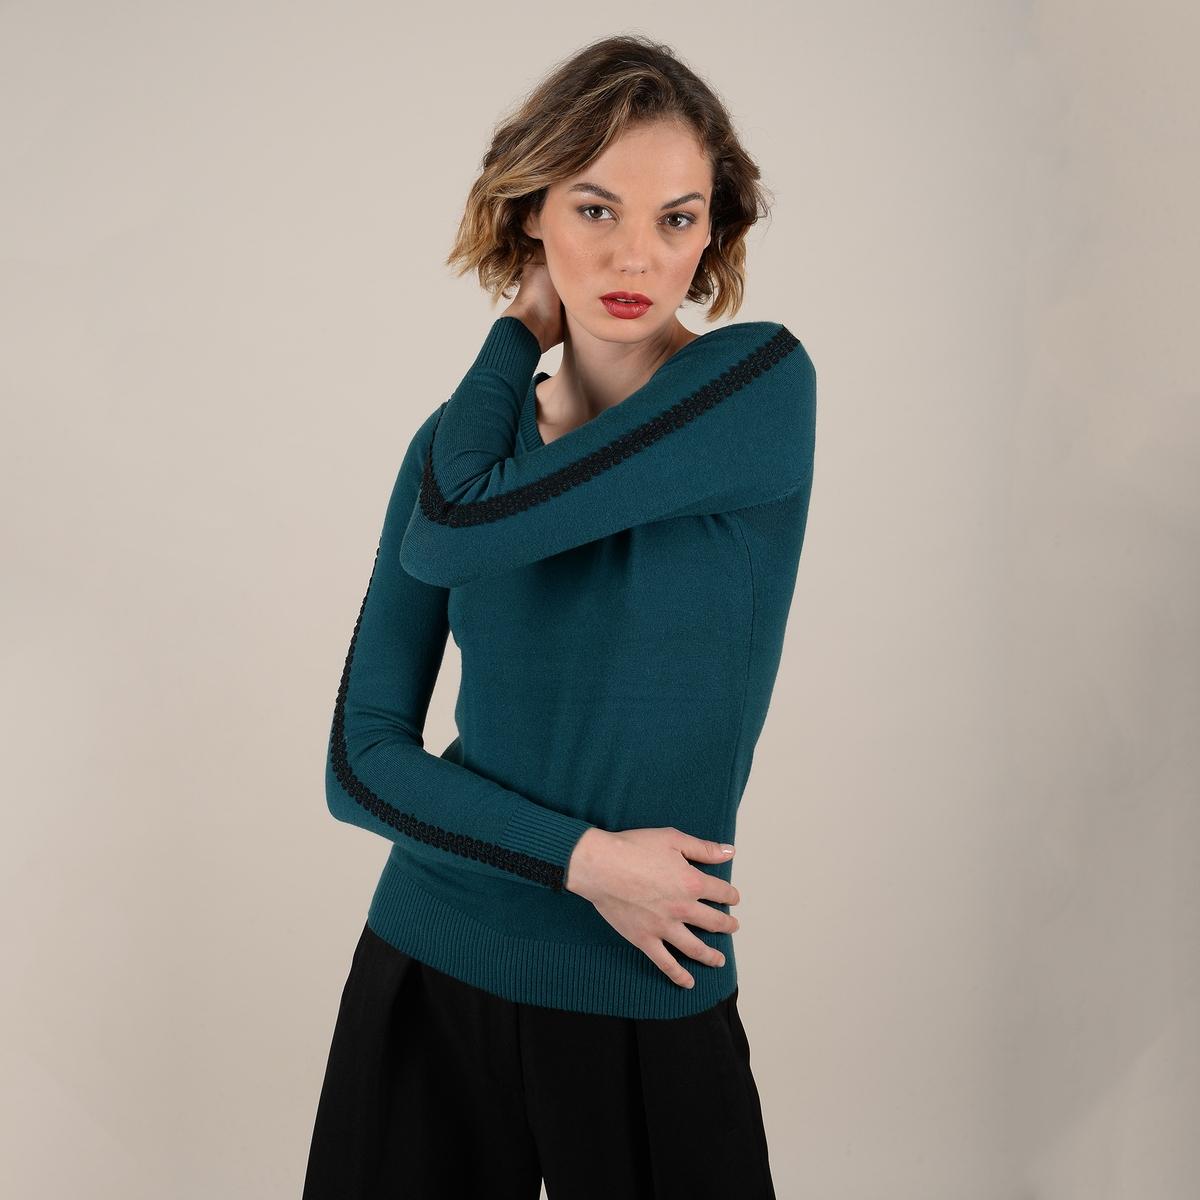 цена Пуловер La Redoute С тонкими полосами из кружева на рукавах M зеленый онлайн в 2017 году